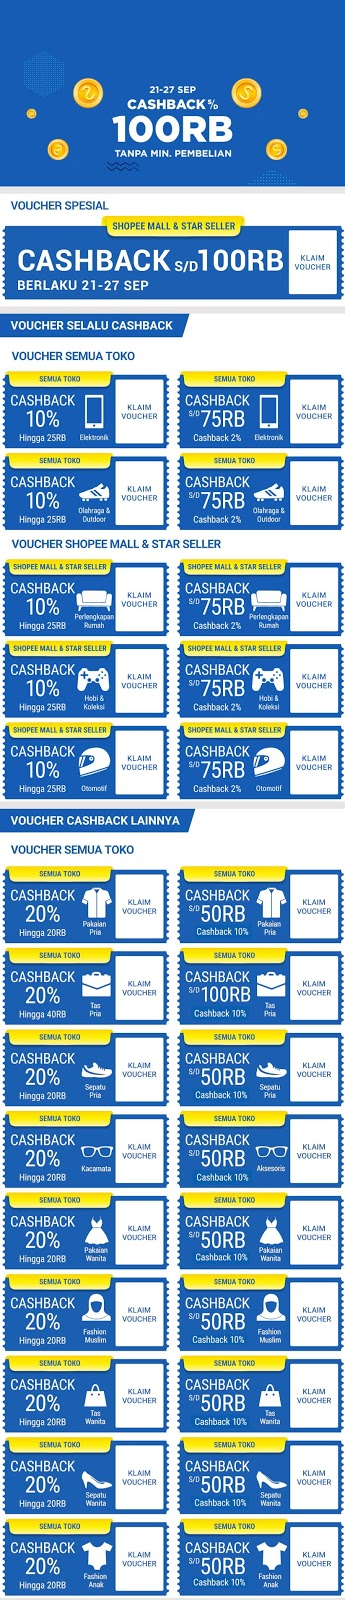 Shopee - Promo Cashback s.d 100 Ribu + Voucher Special (s.d 27 Sept 2018)